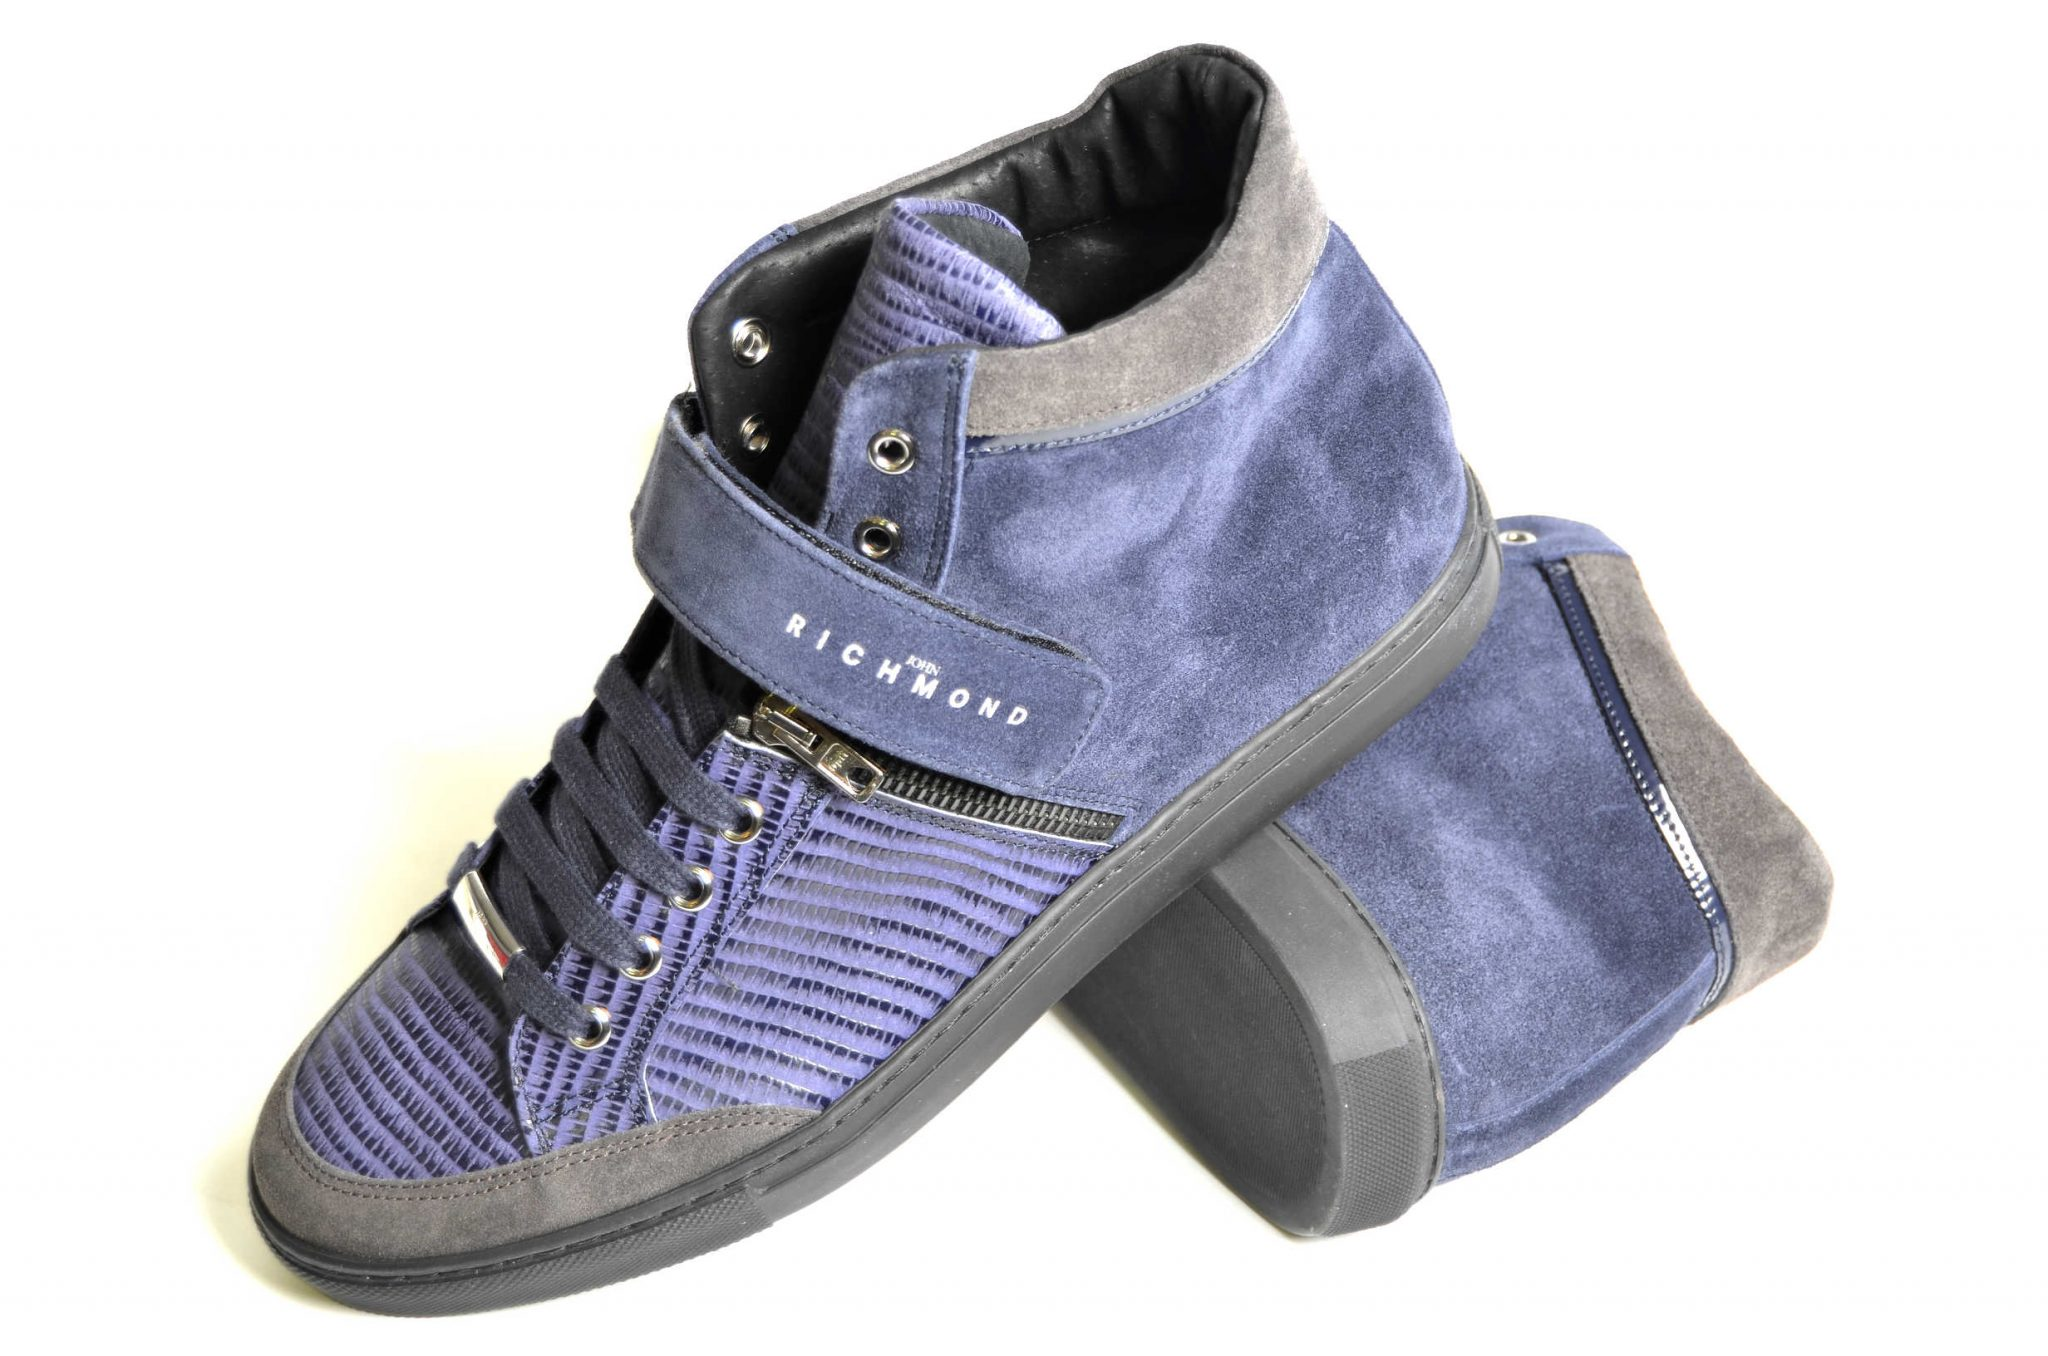 3ecce3f5921e Pánske topánky John Richmond - Made in Italy - TOPDIMILANO